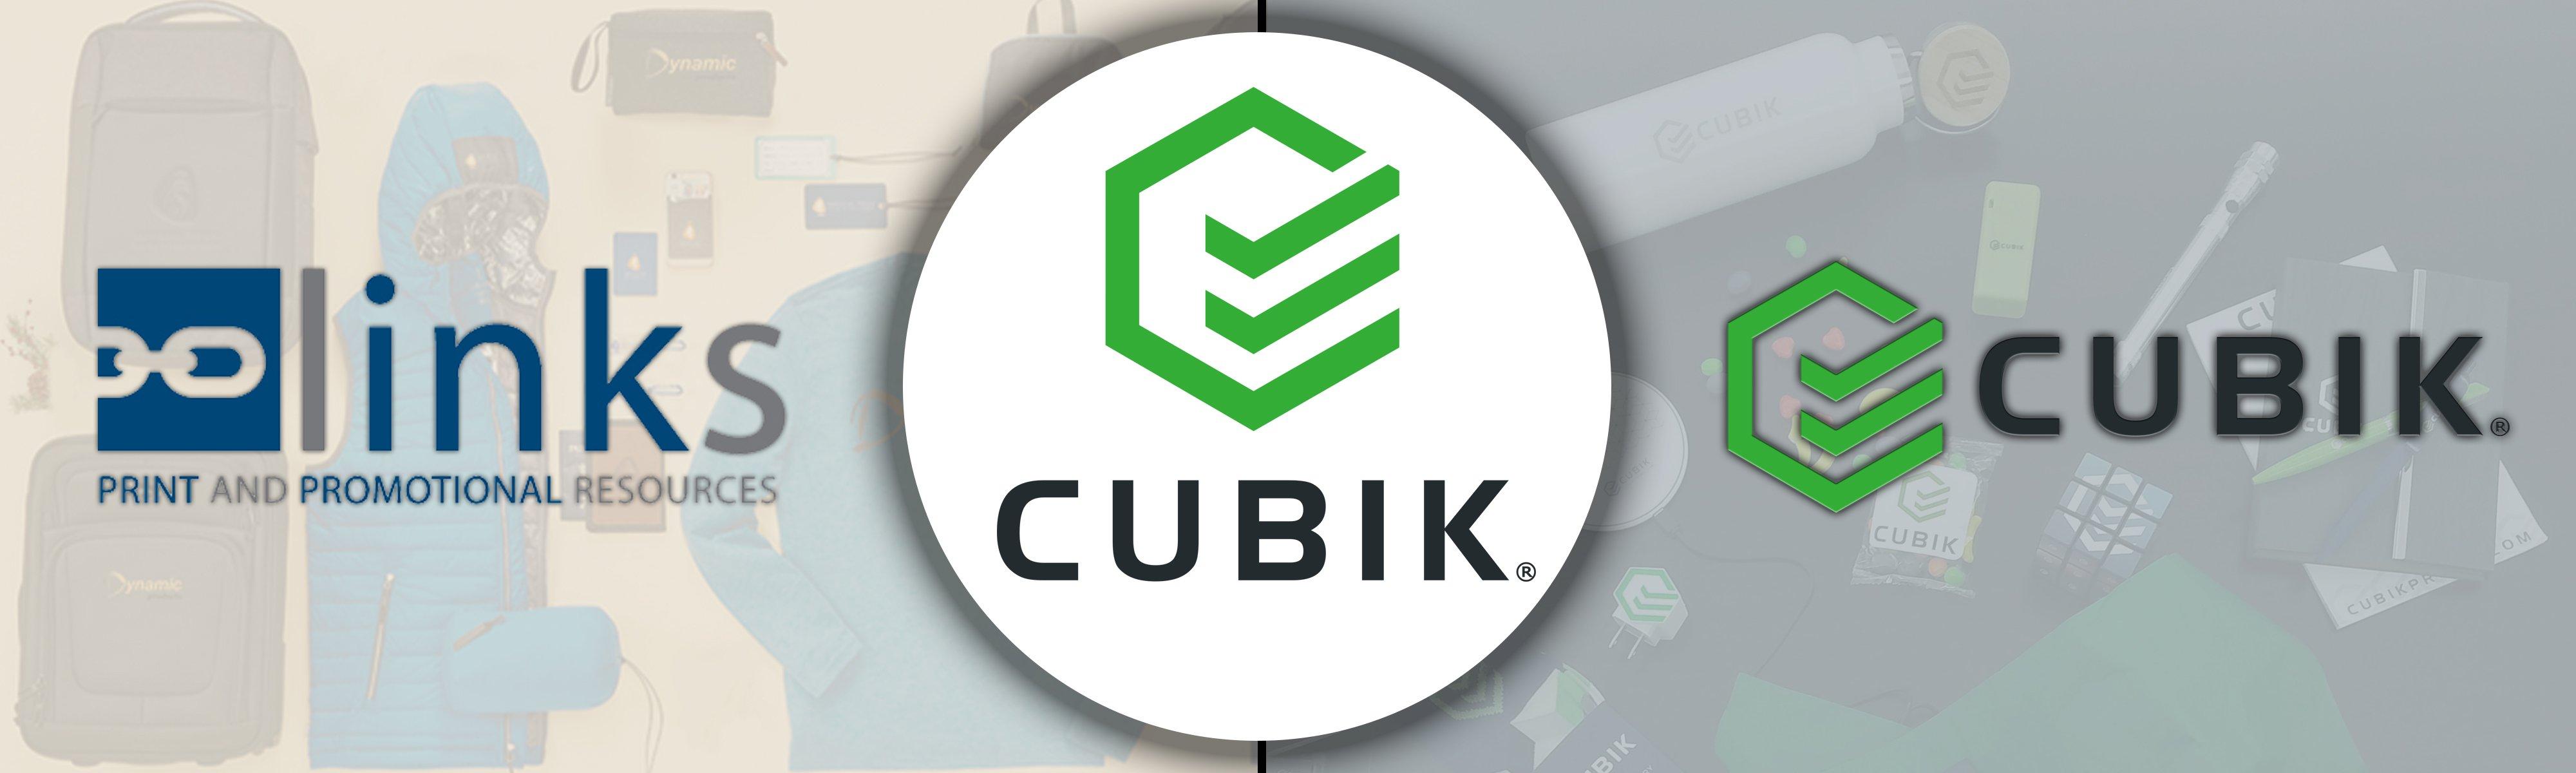 Links Print Resources Rebrand